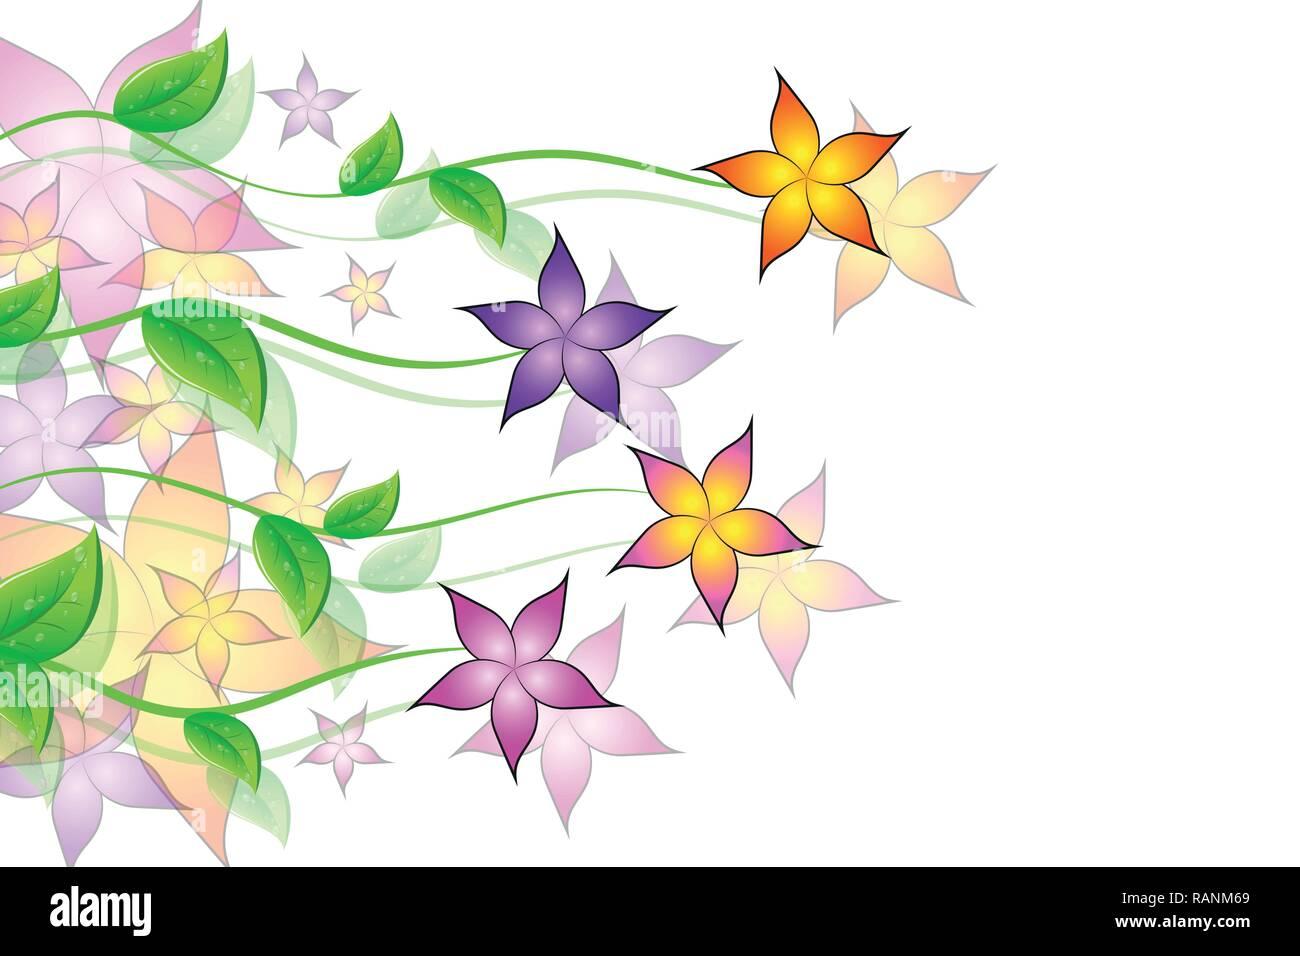 Bunte Blumen Ranke flora Hintergrund Vektor-illustration EPS 10. Stockbild